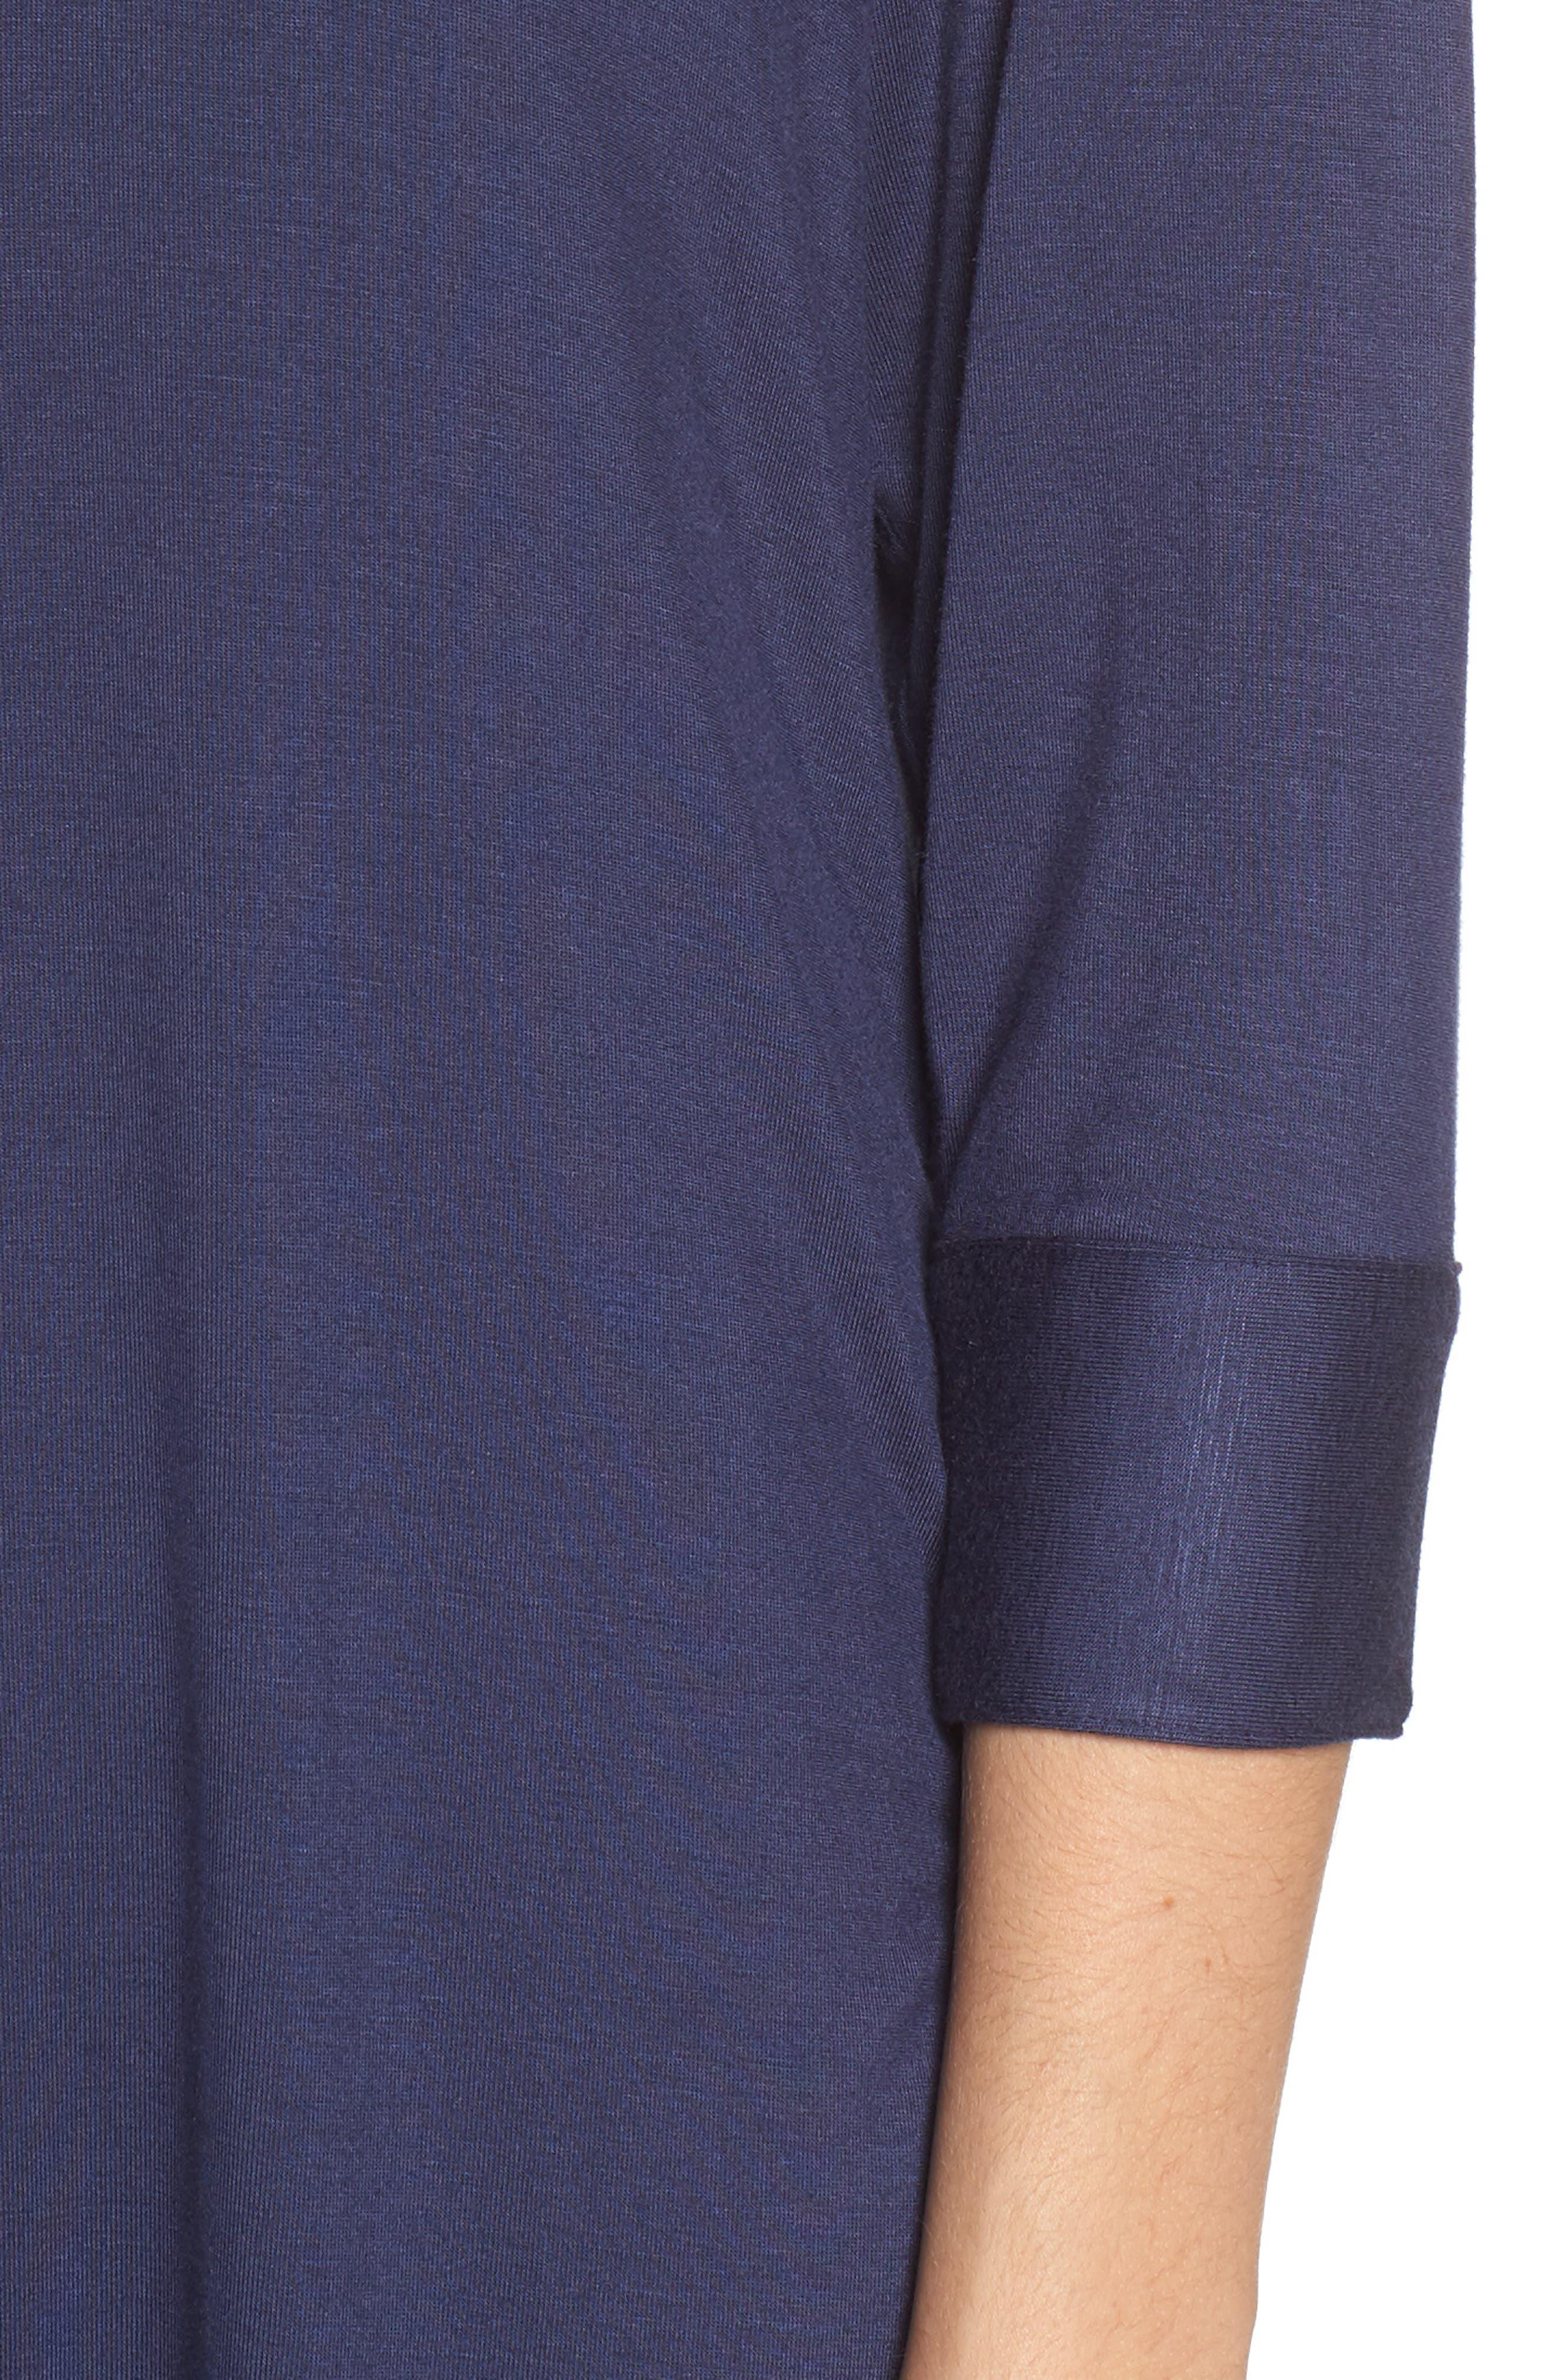 Vivian Sleep Shirt,                             Alternate thumbnail 4, color,                             NAVY